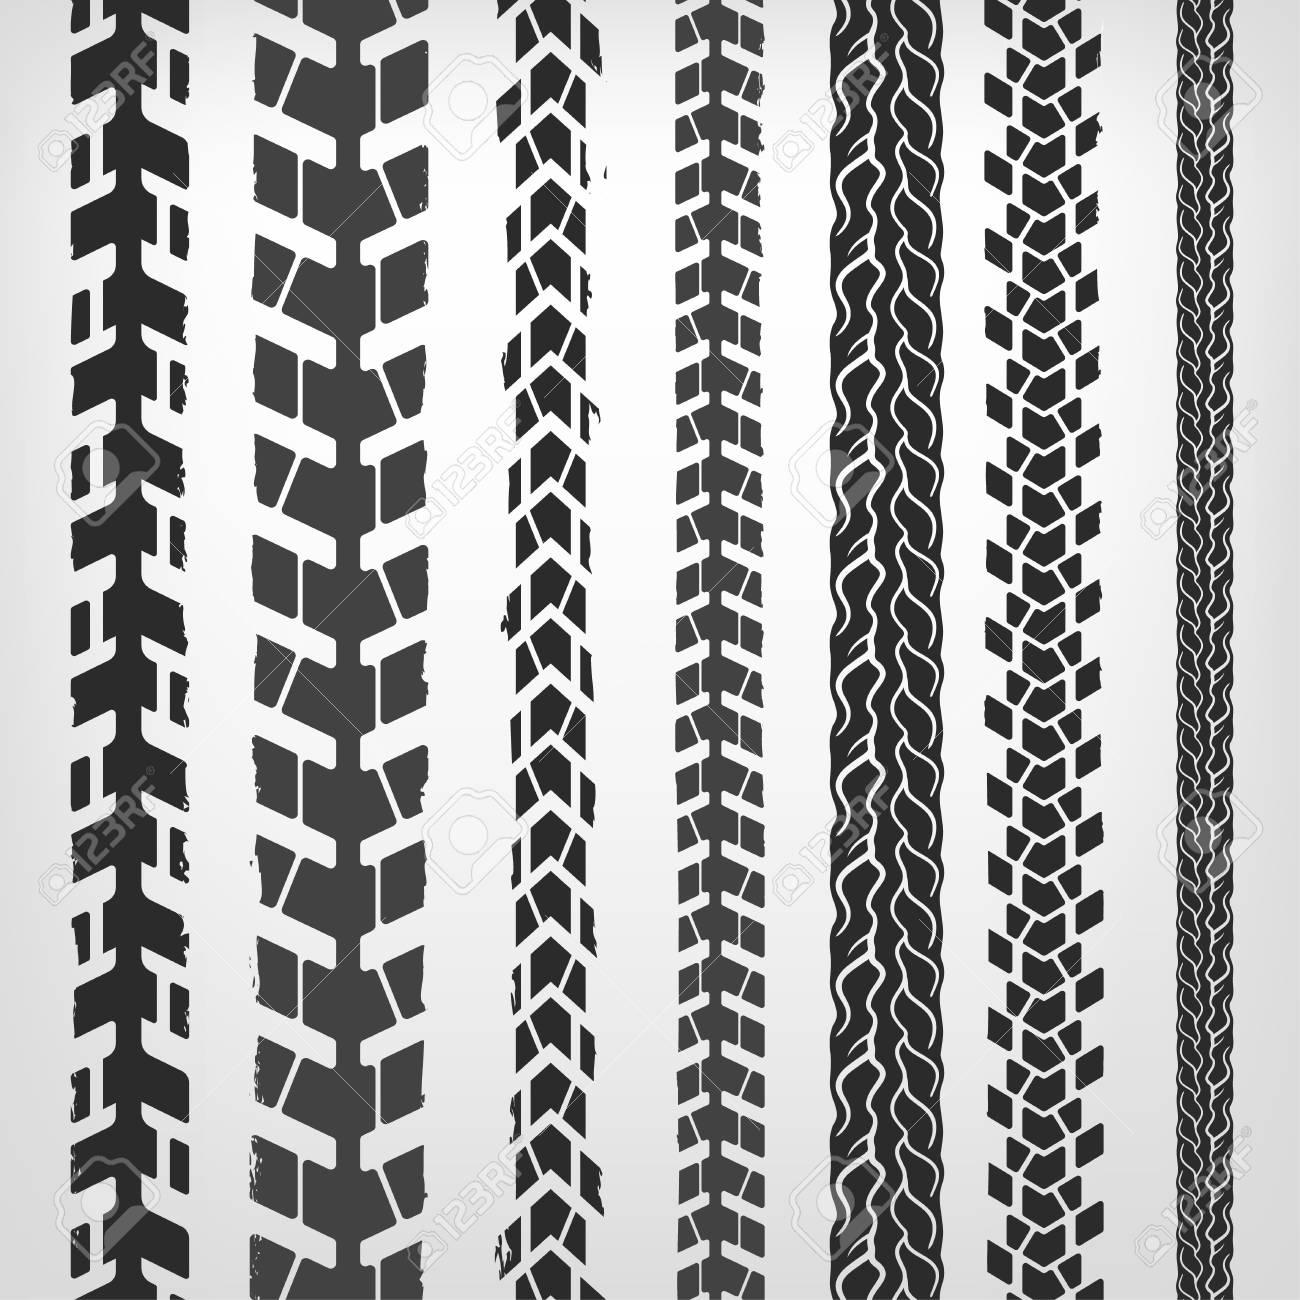 motorcycle tire tracks vector illustration grunge automotive rh 123rf com Tire Track Font Mud Tire Tracks